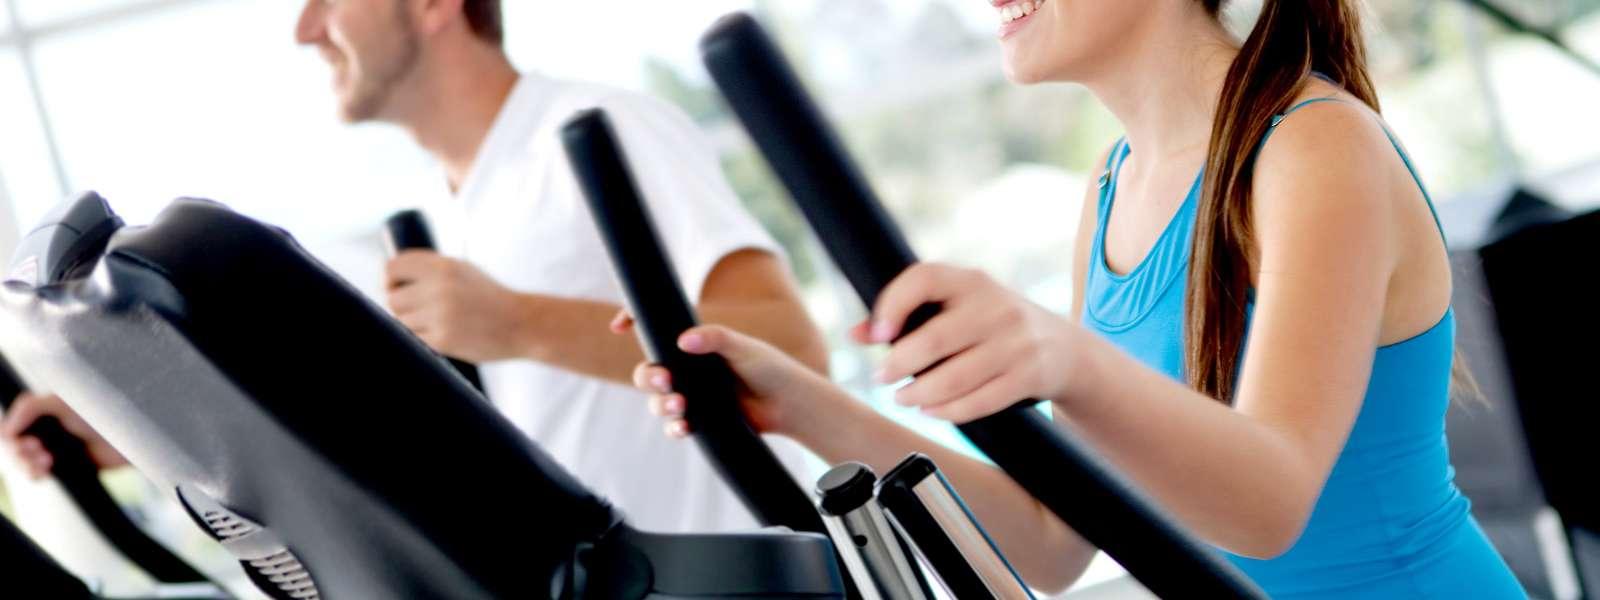 Fitness | Beach Club